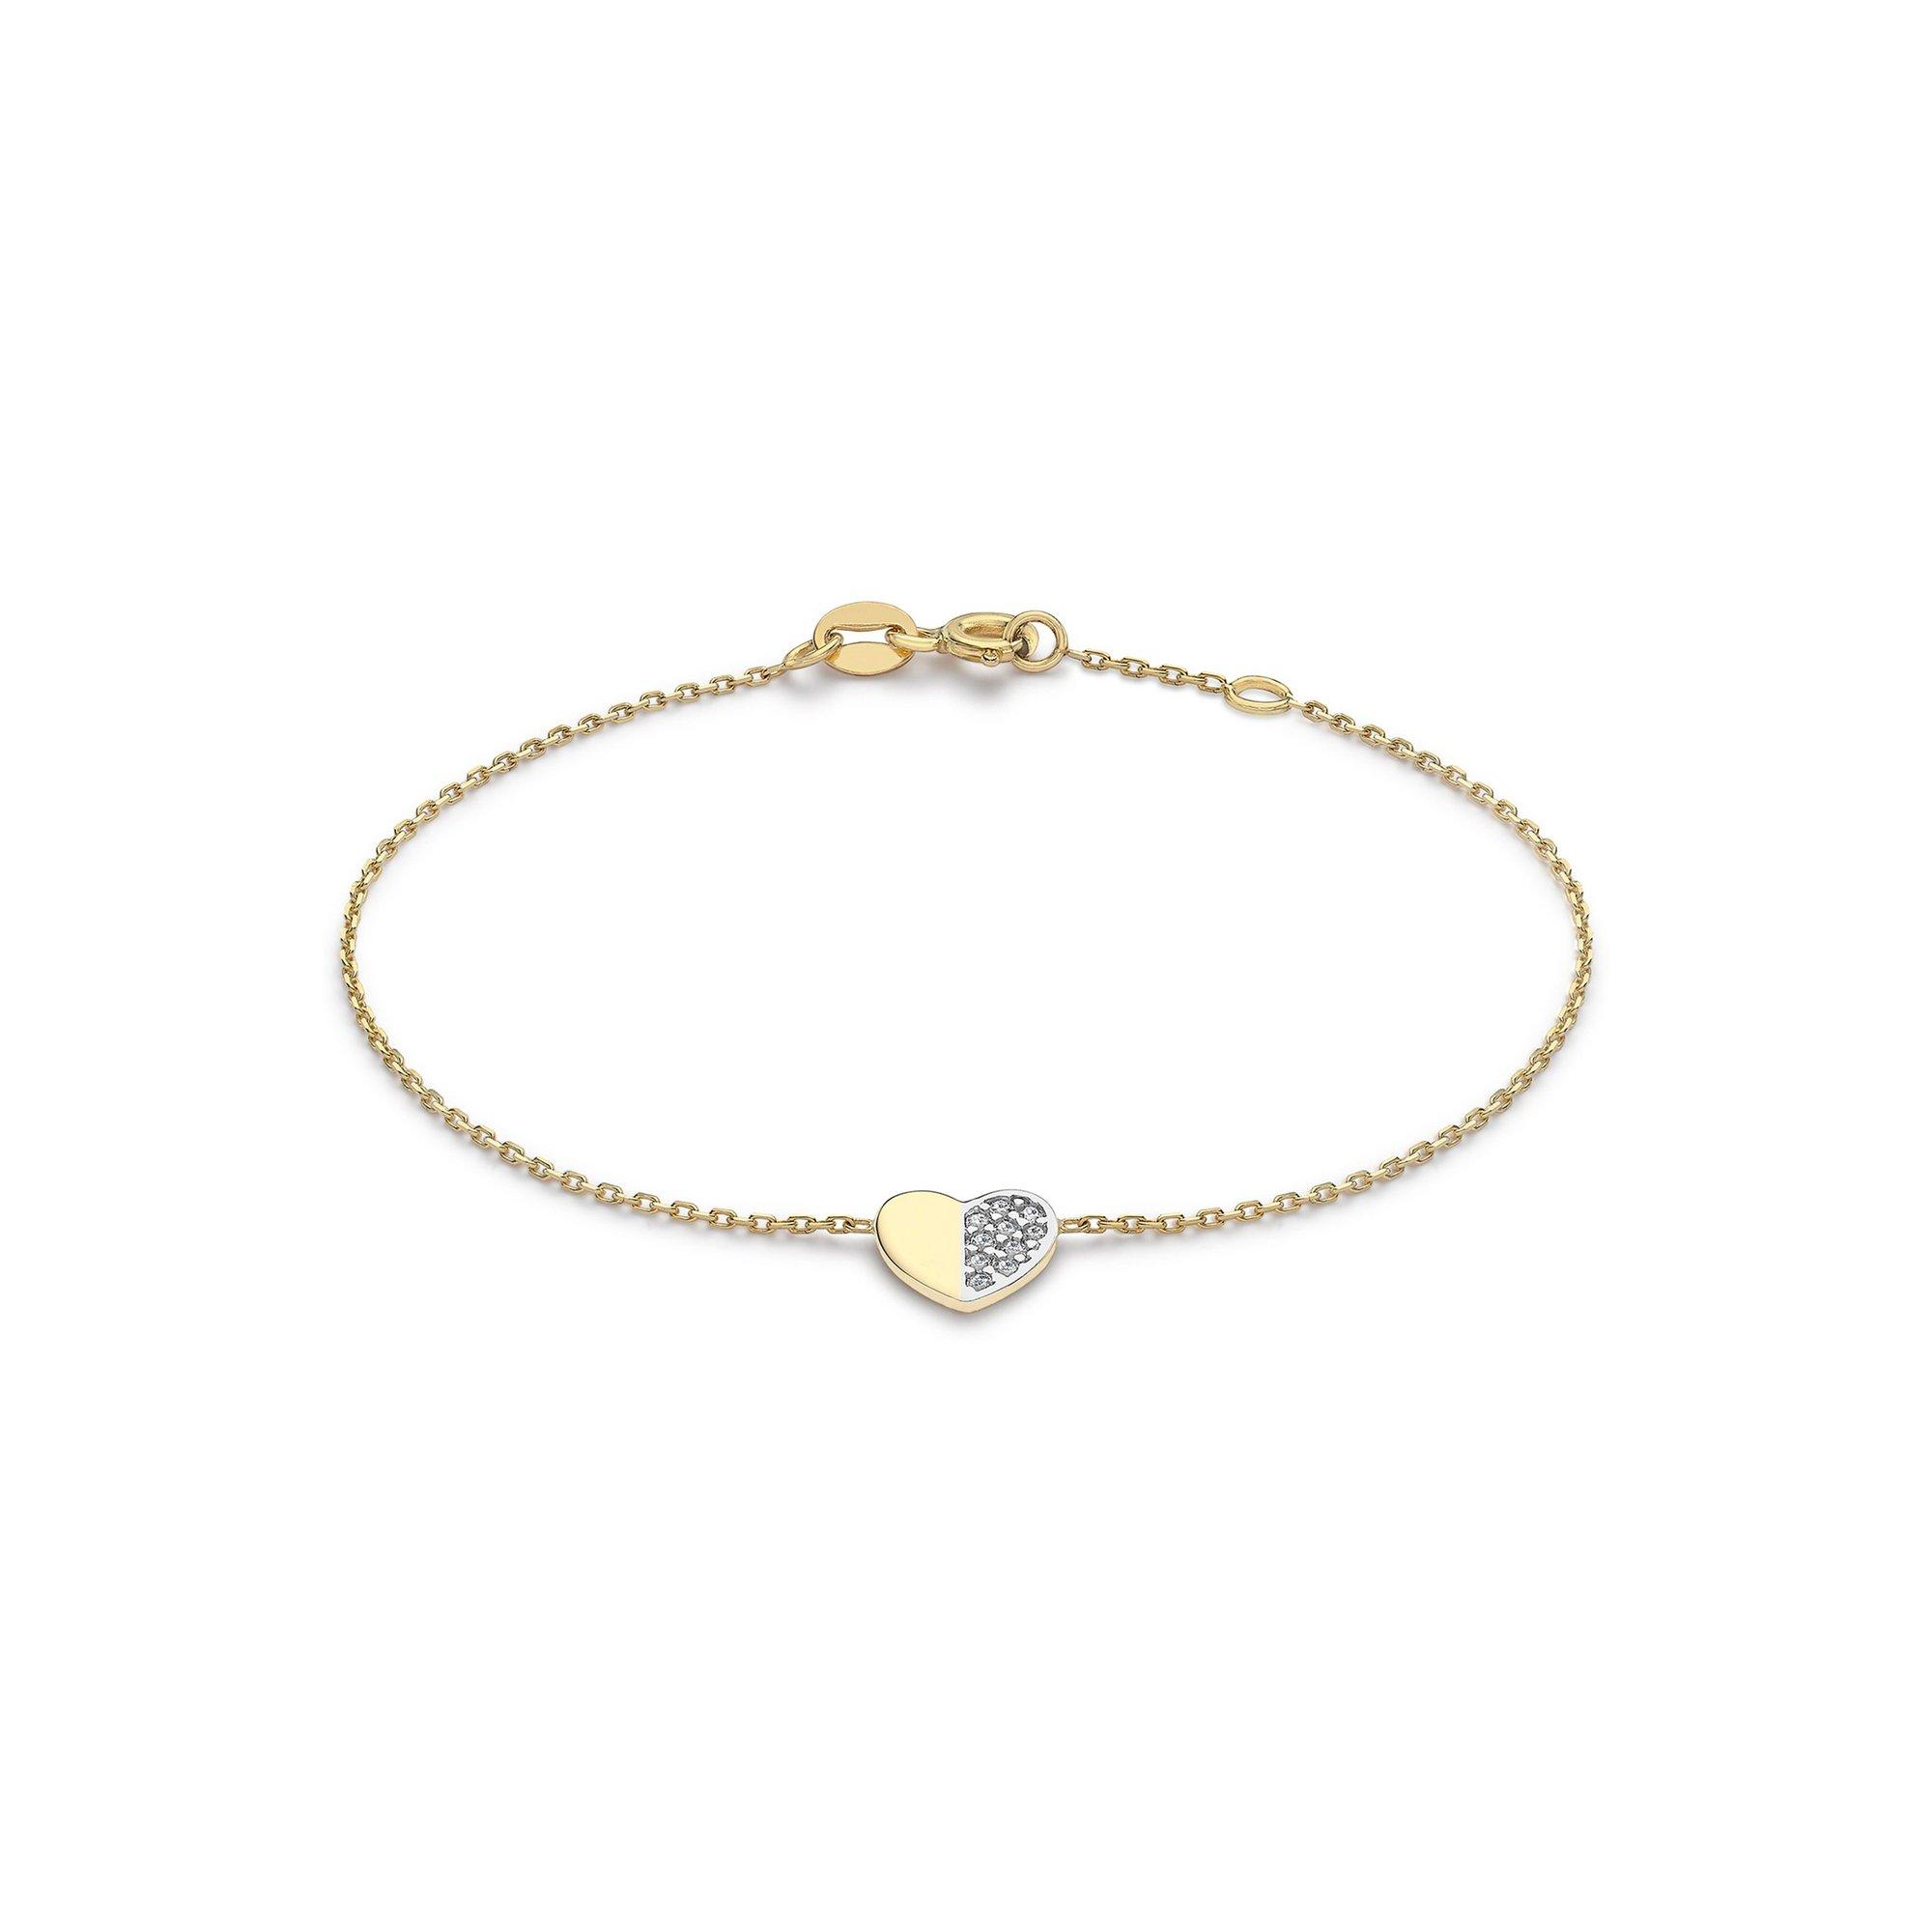 Image of 9ct 2-Tone Gold CZ Heart Adjustable Bracelet